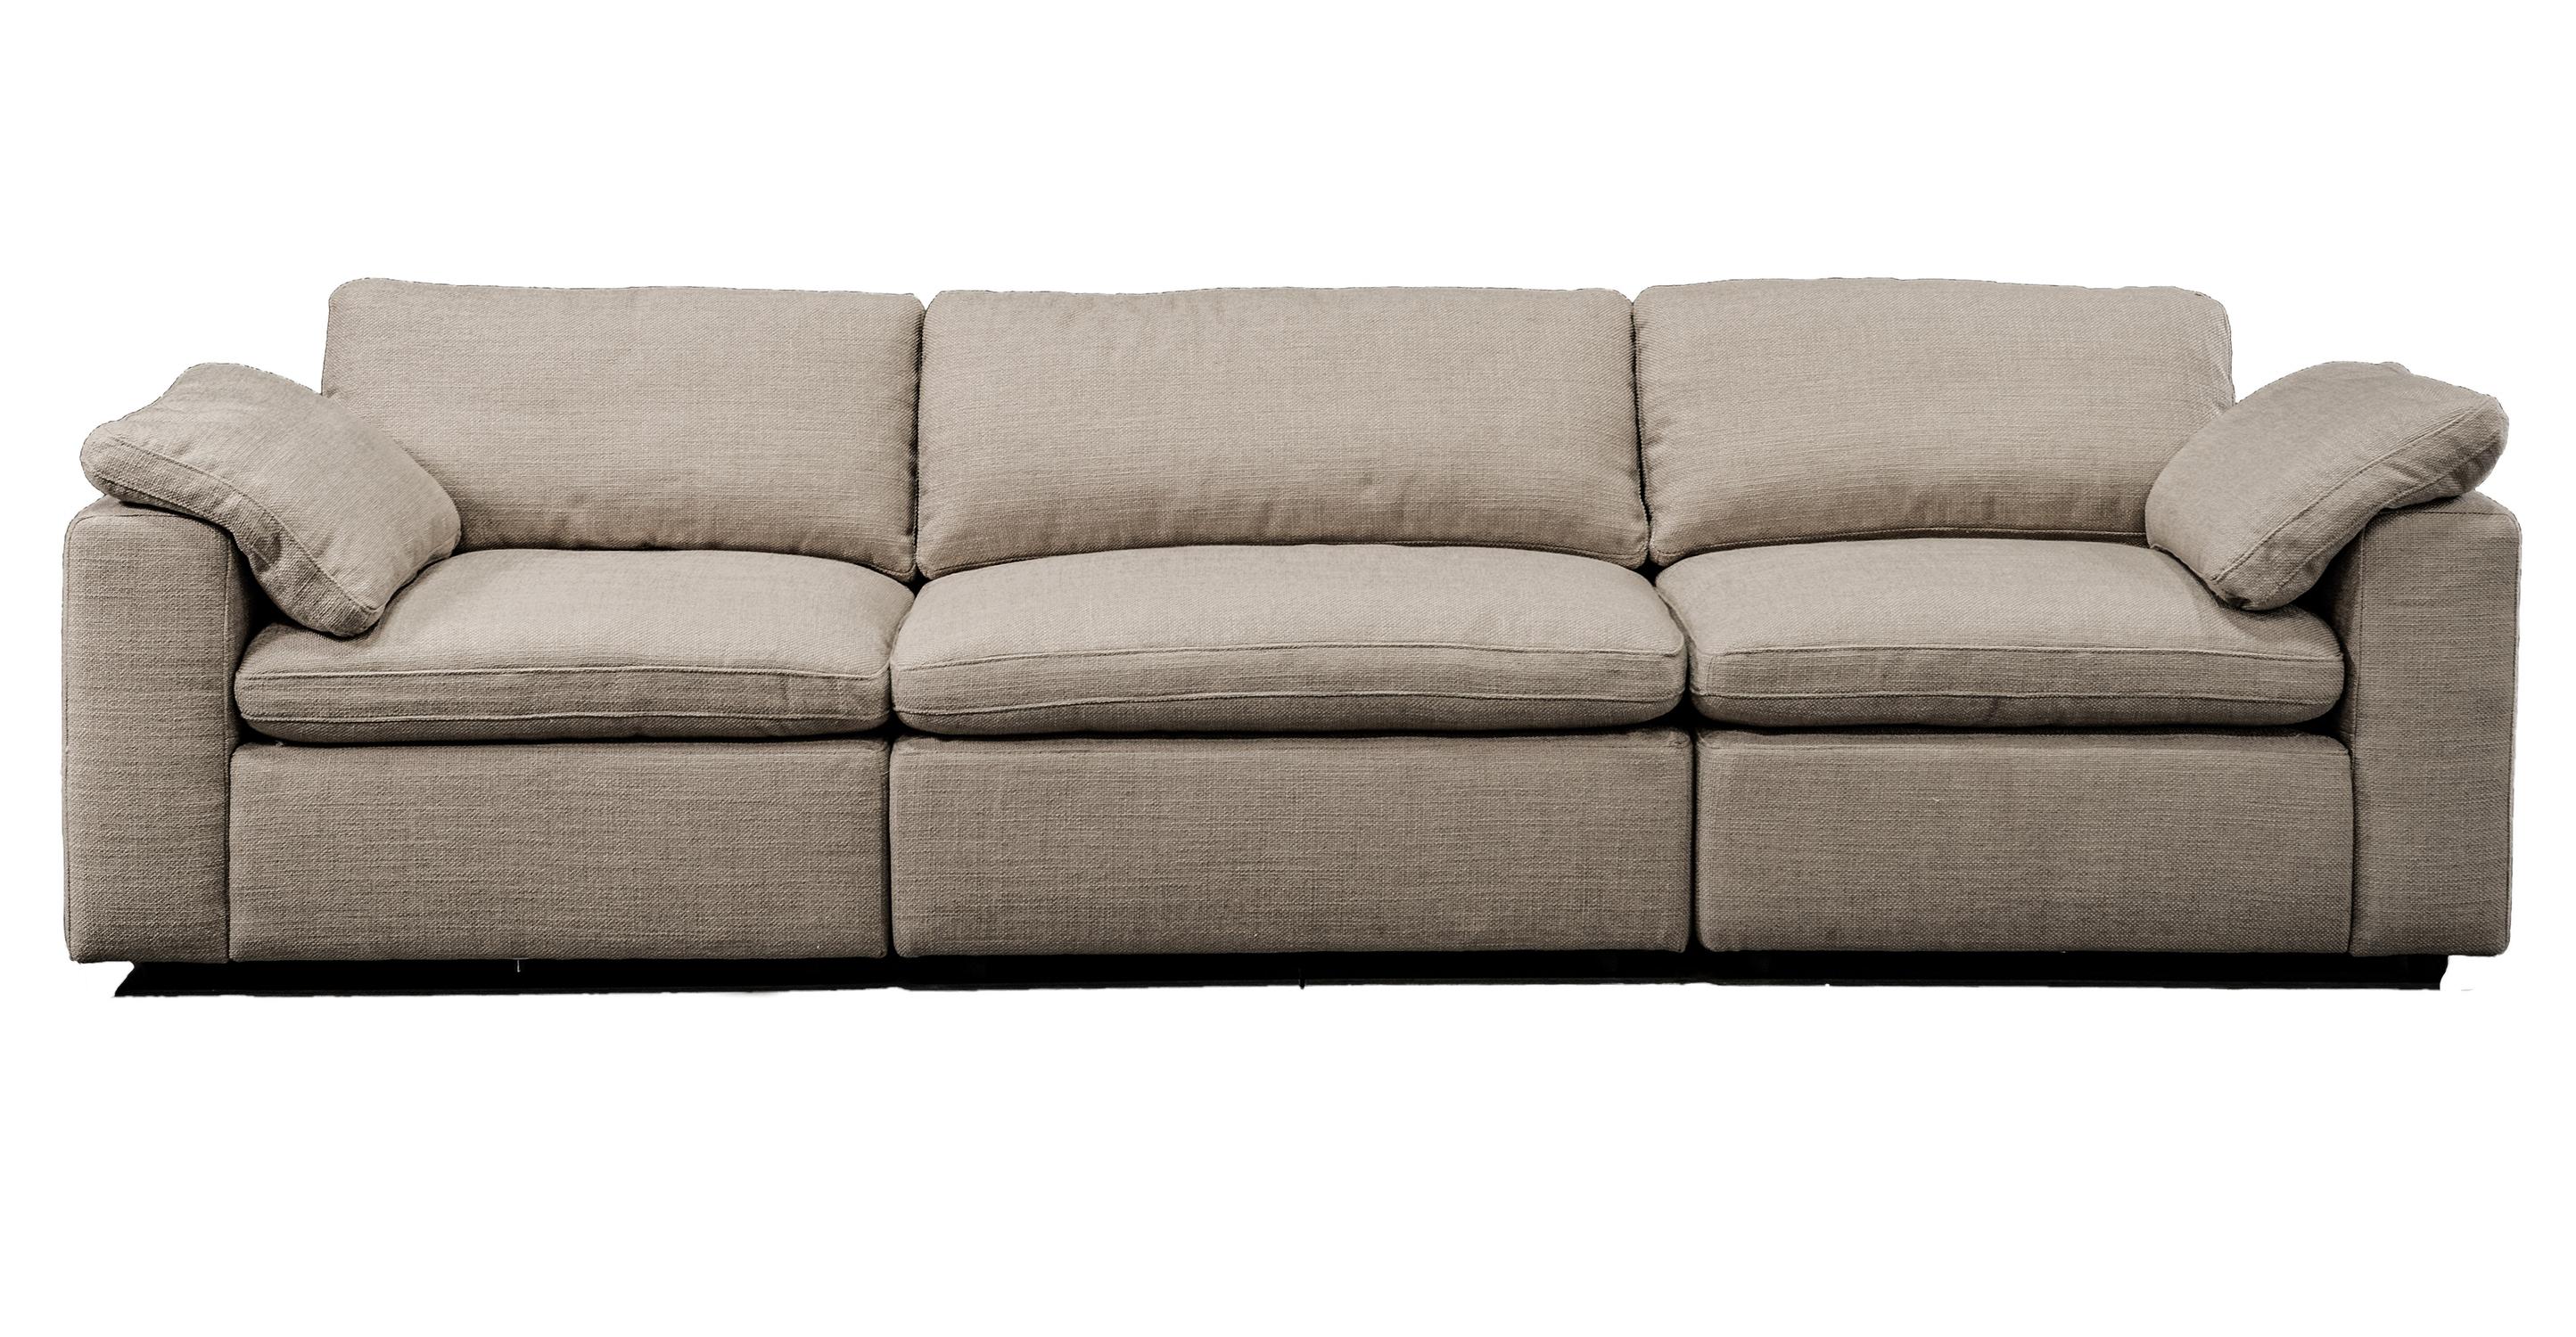 "Nest Modular 120"" Finch 3-pc Fabric Sofa Sectional, Dunes"